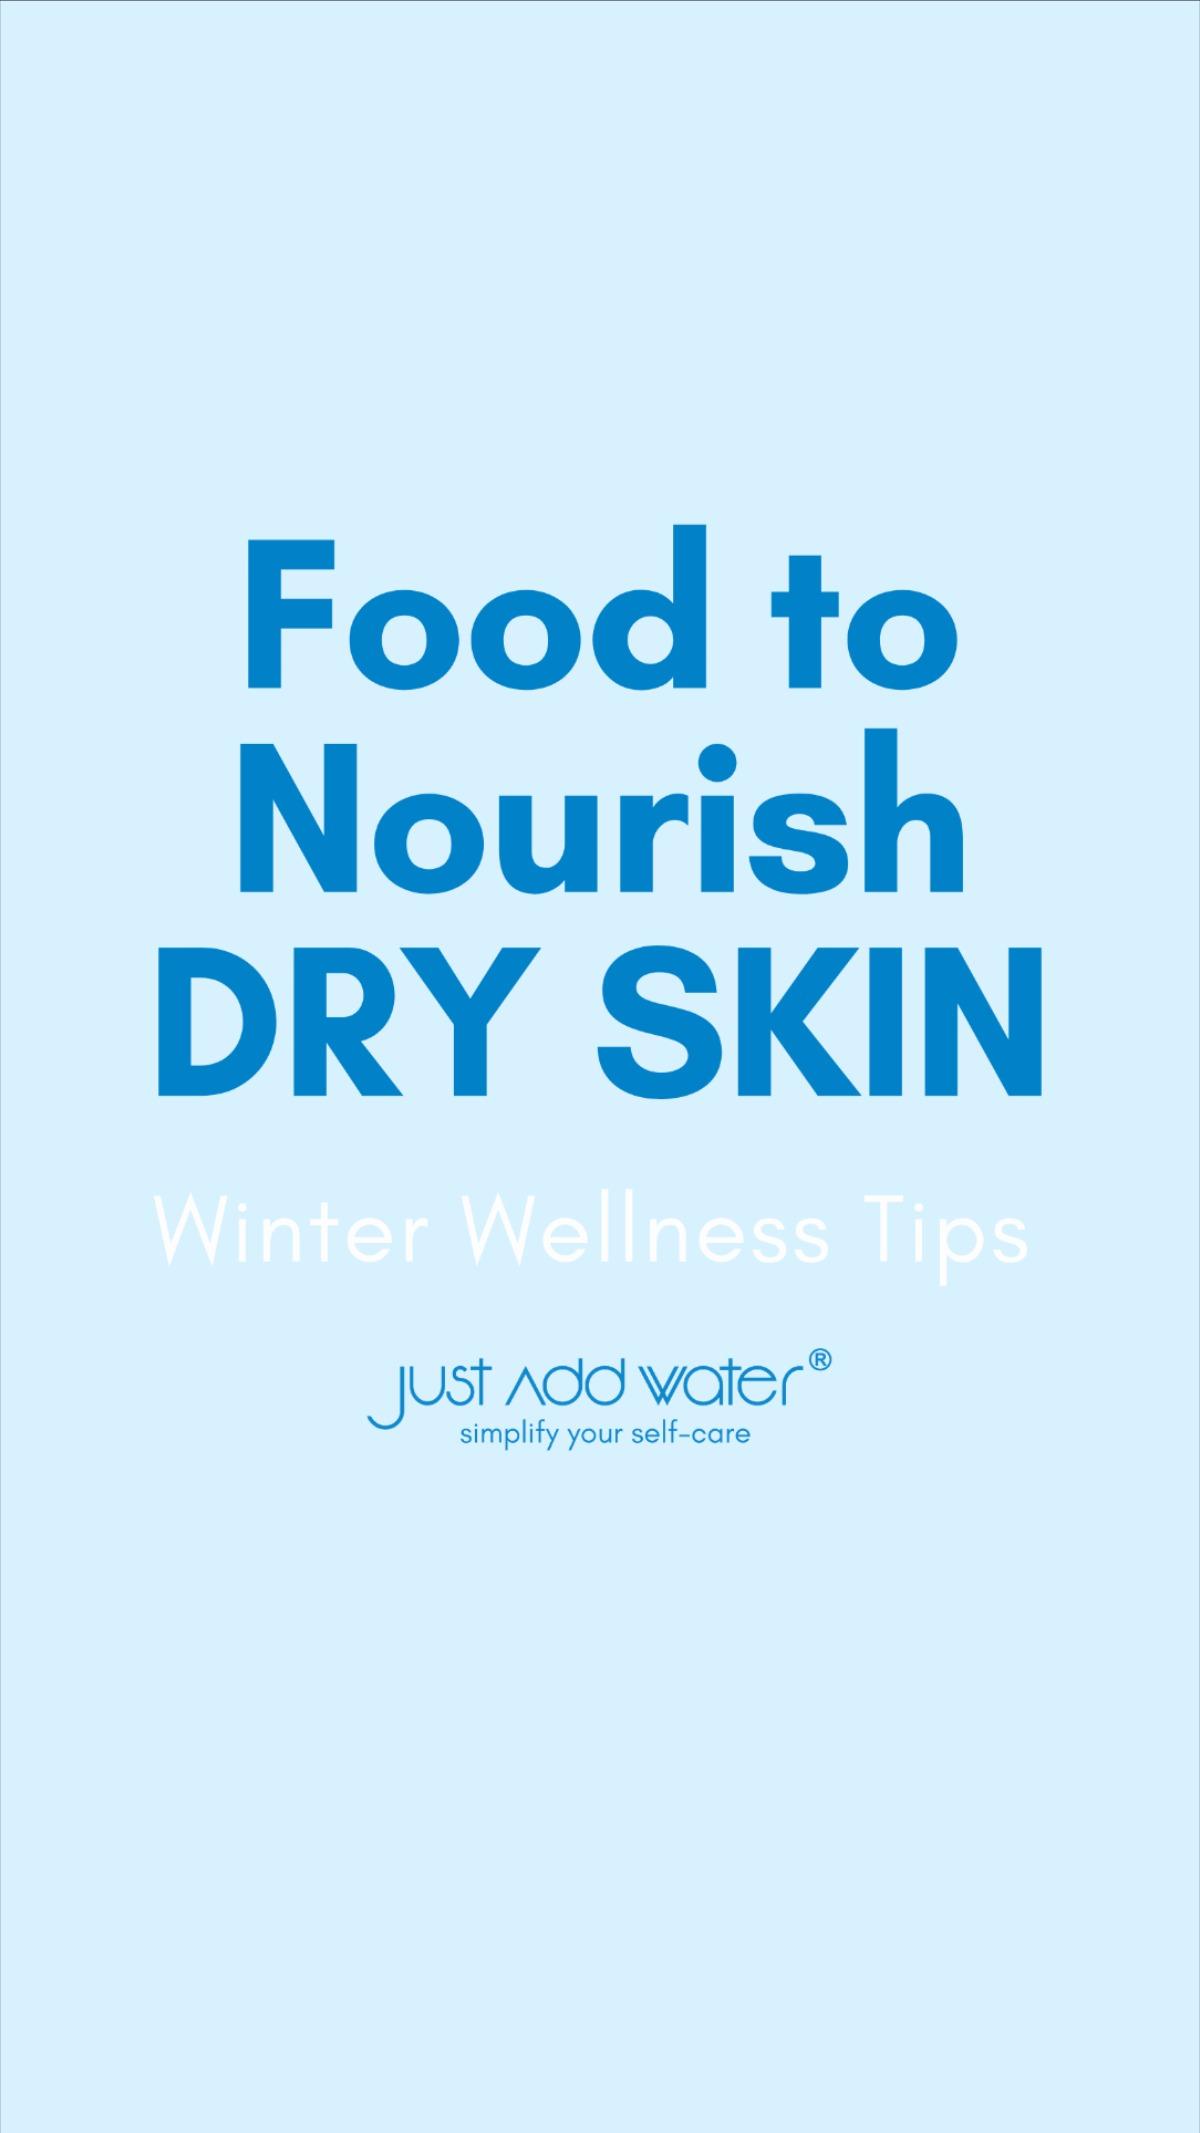 Plant-Based Foods To Nourish Dry Skin